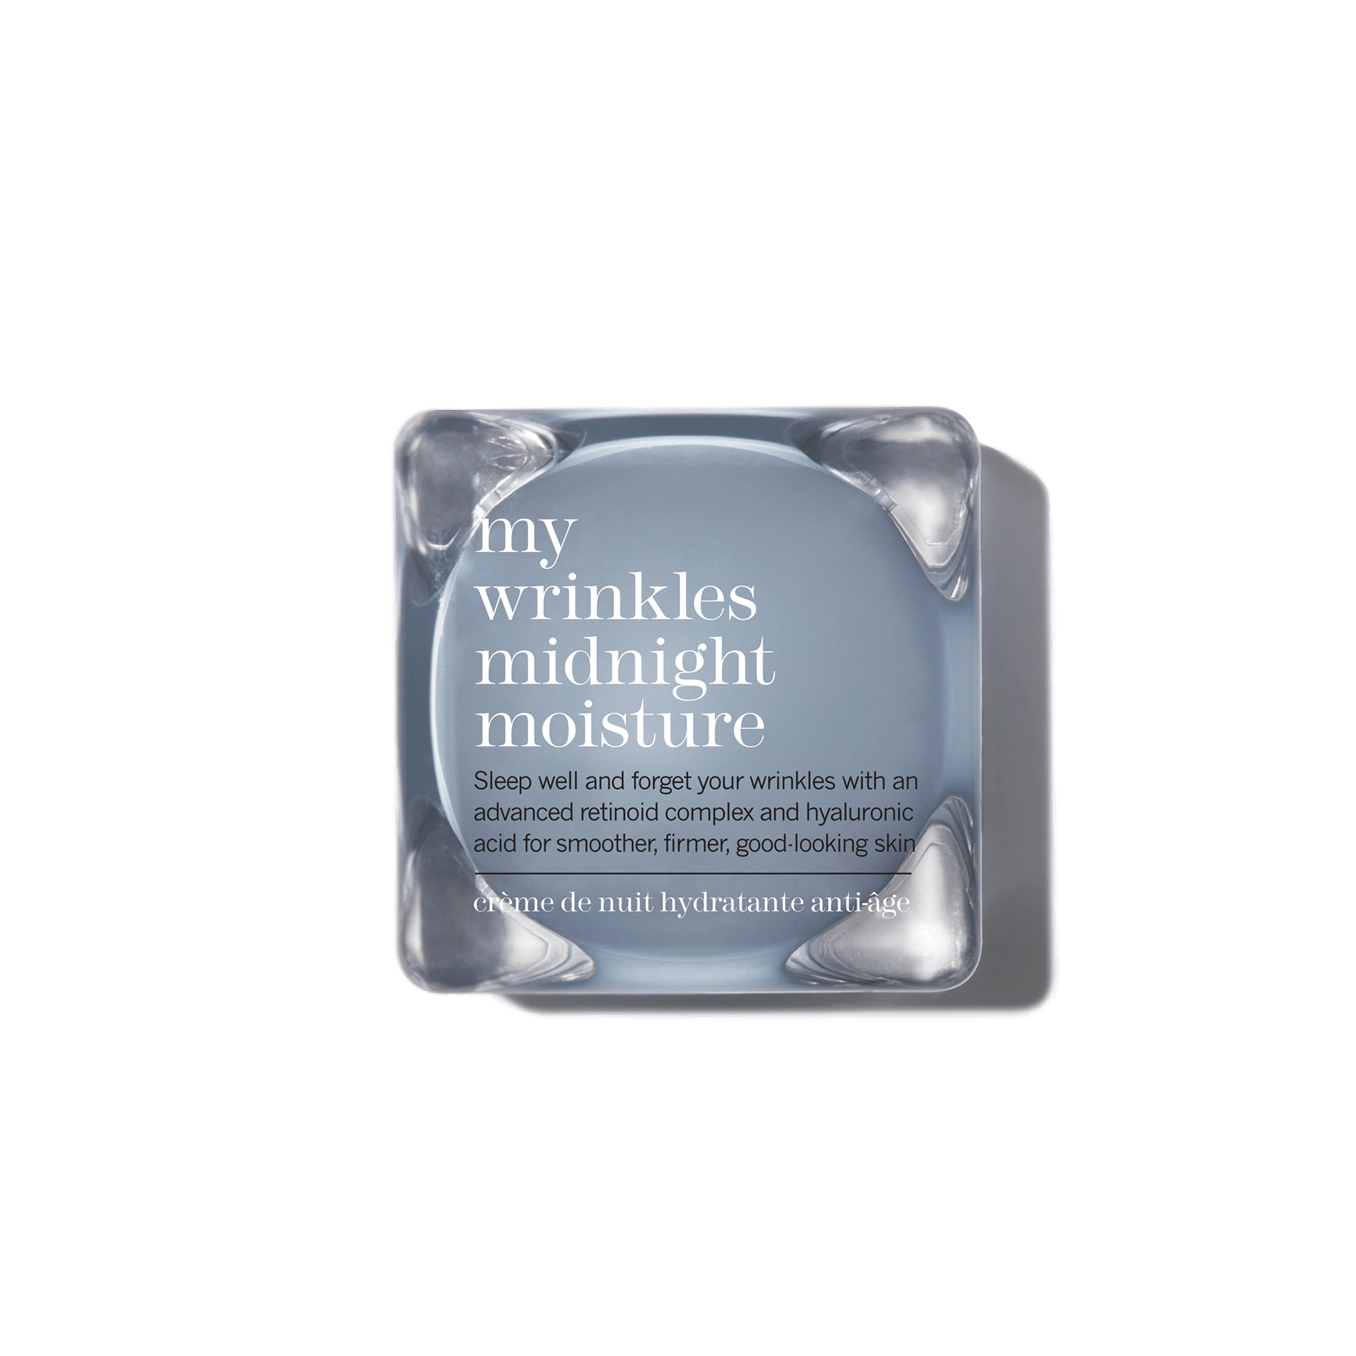 my wrinkles midnight moisture